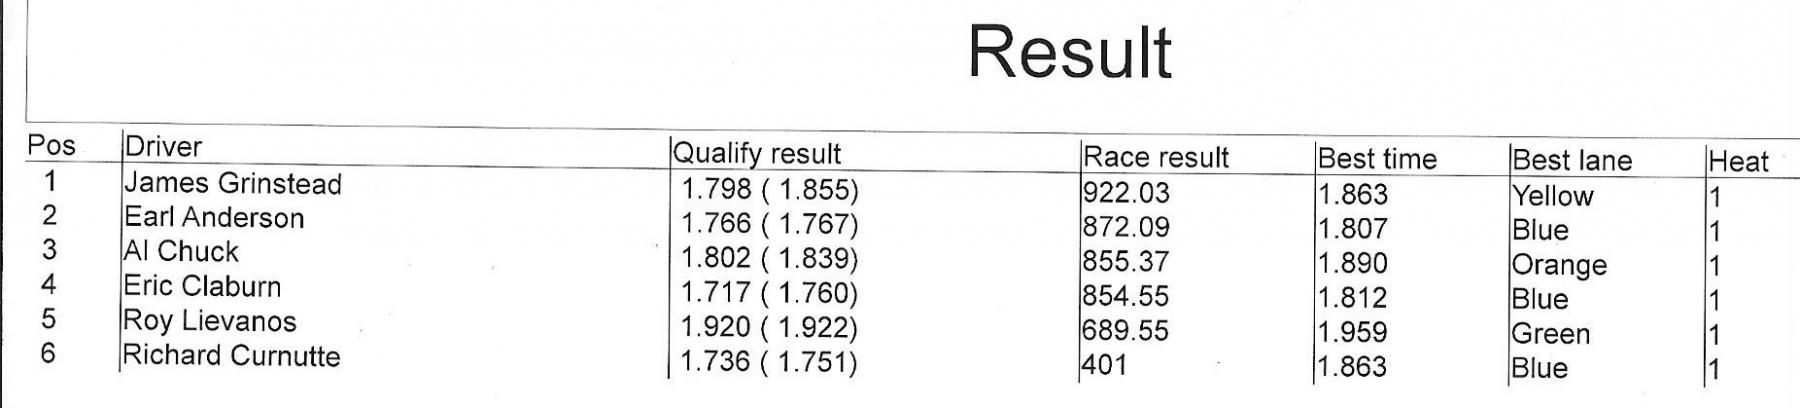 3820 open results.jpeg